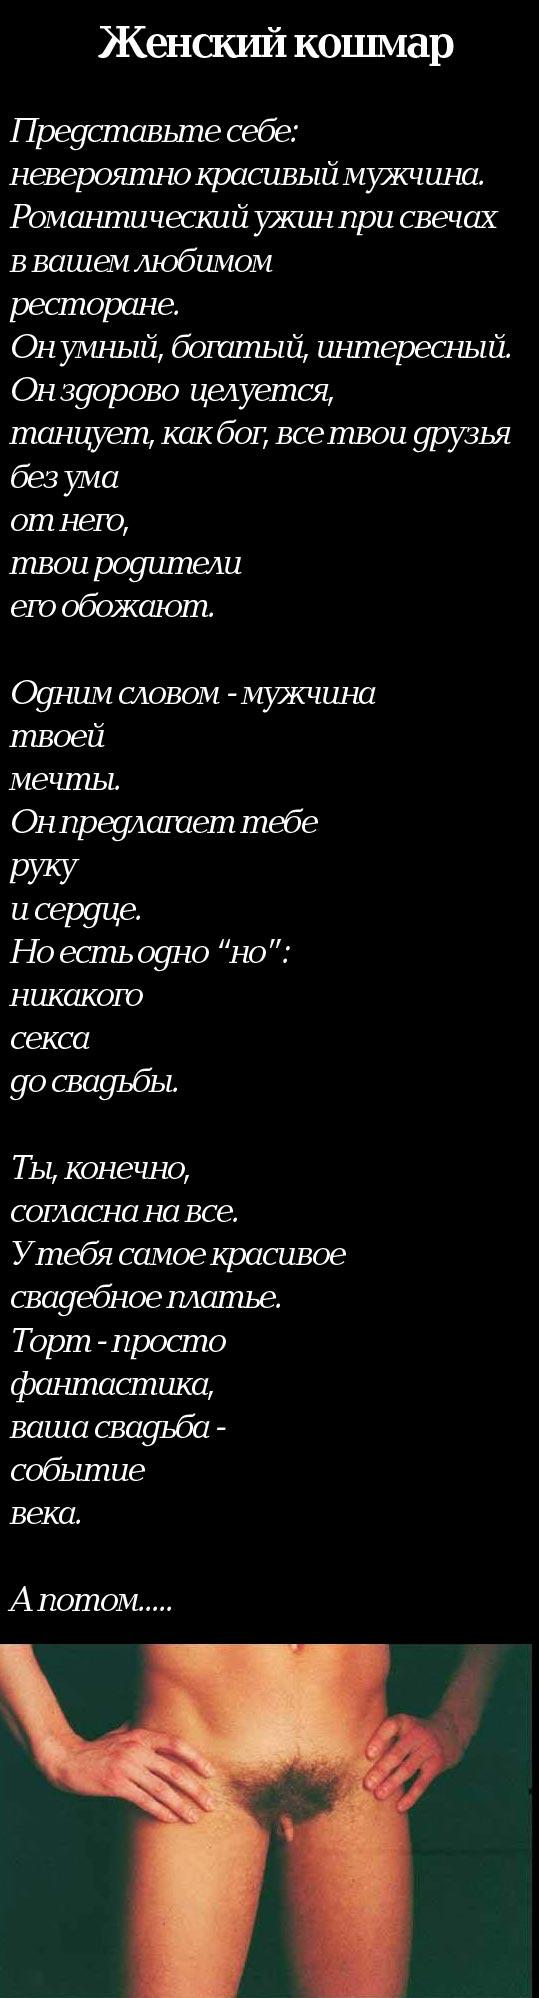 http://de.fishki.net/picsw/112007/13/koshmar/1.jpg